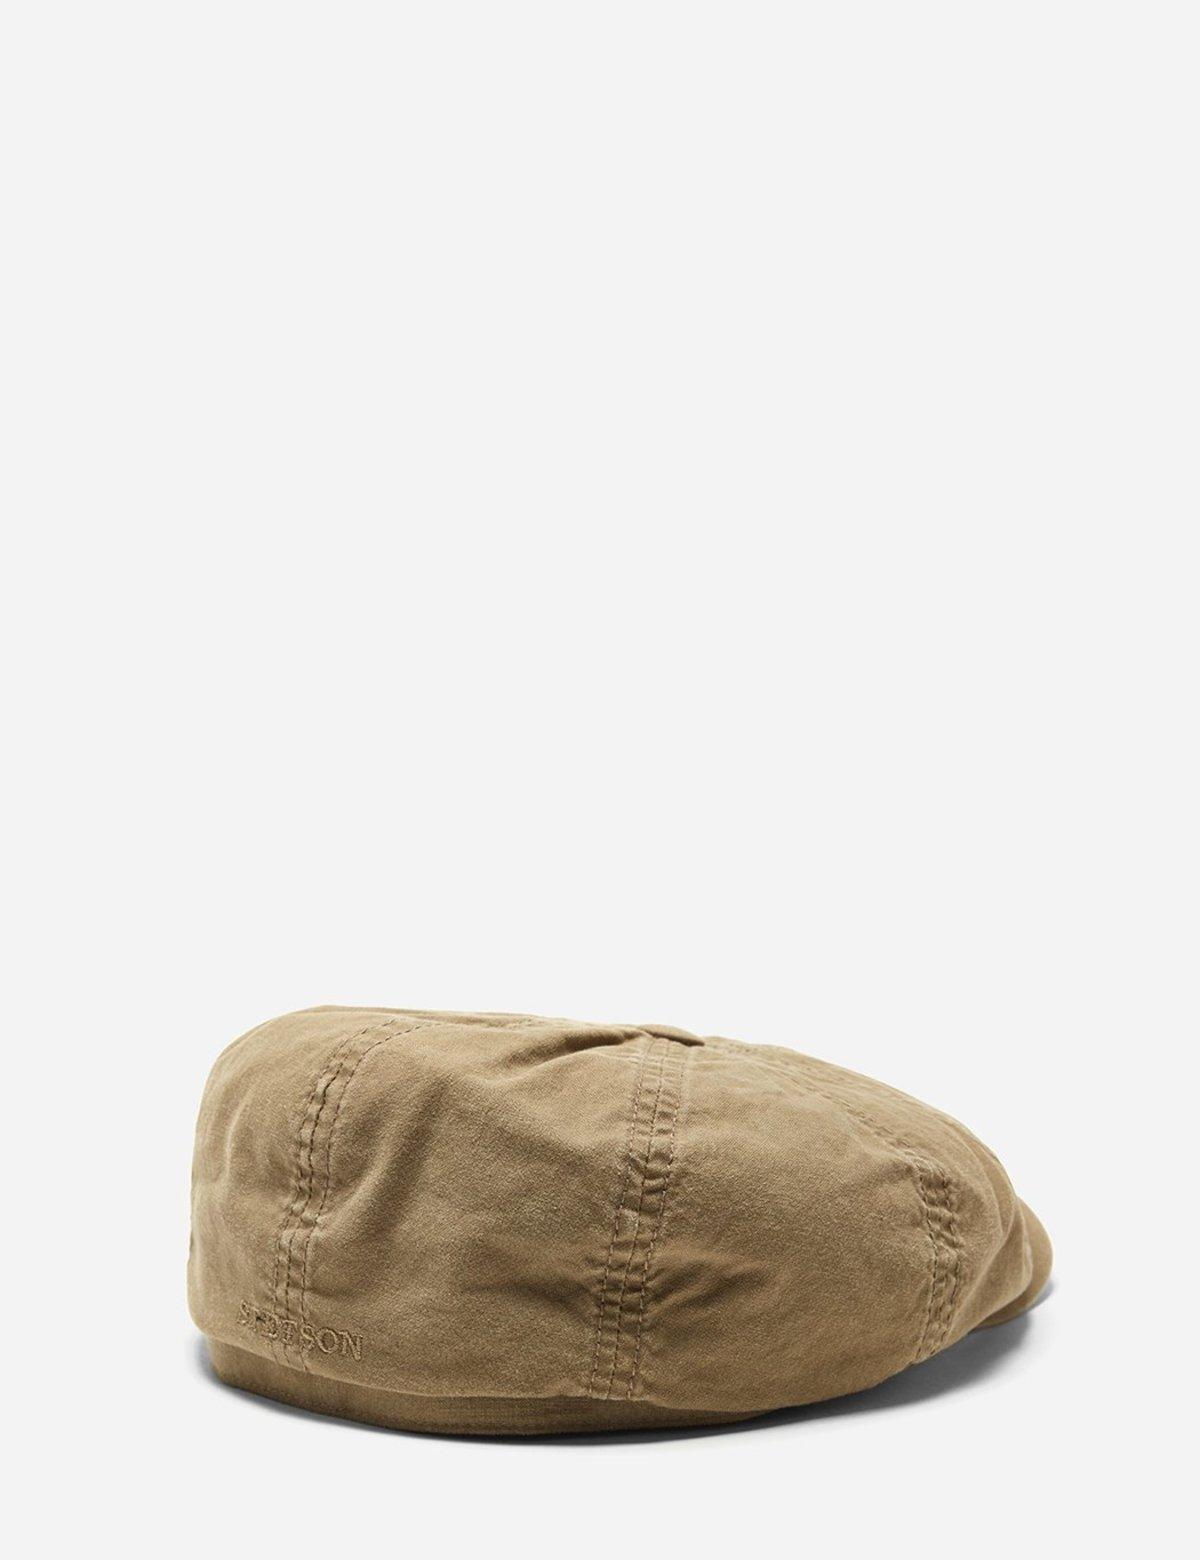 137b3b56766bc6 Stetson Hats Stetson Hatteras Delave Organic Cotton Newsboy Cap ...